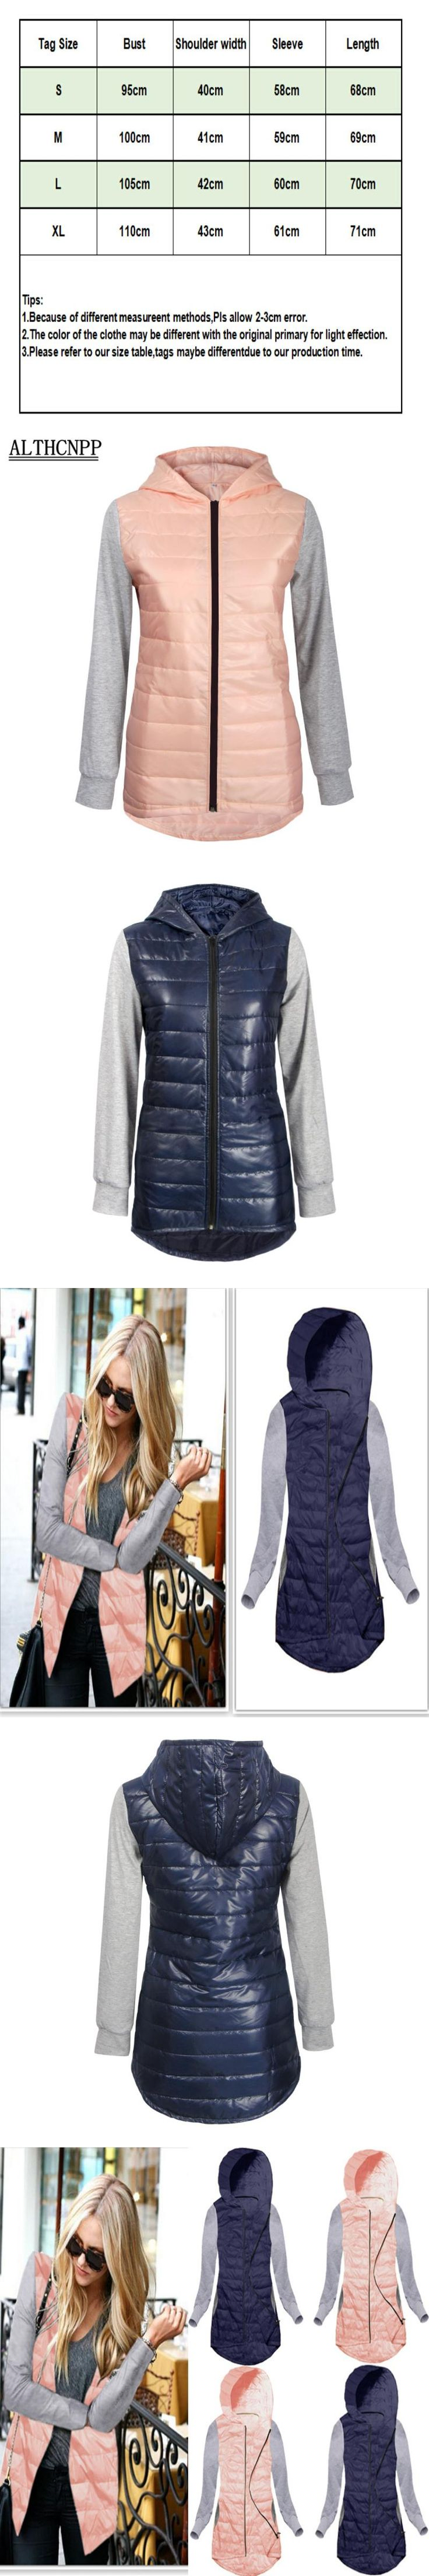 camperas mujer abrigo invierno 2017 women winter coats thin slim long winter jacket female jacket parkas ladies coats